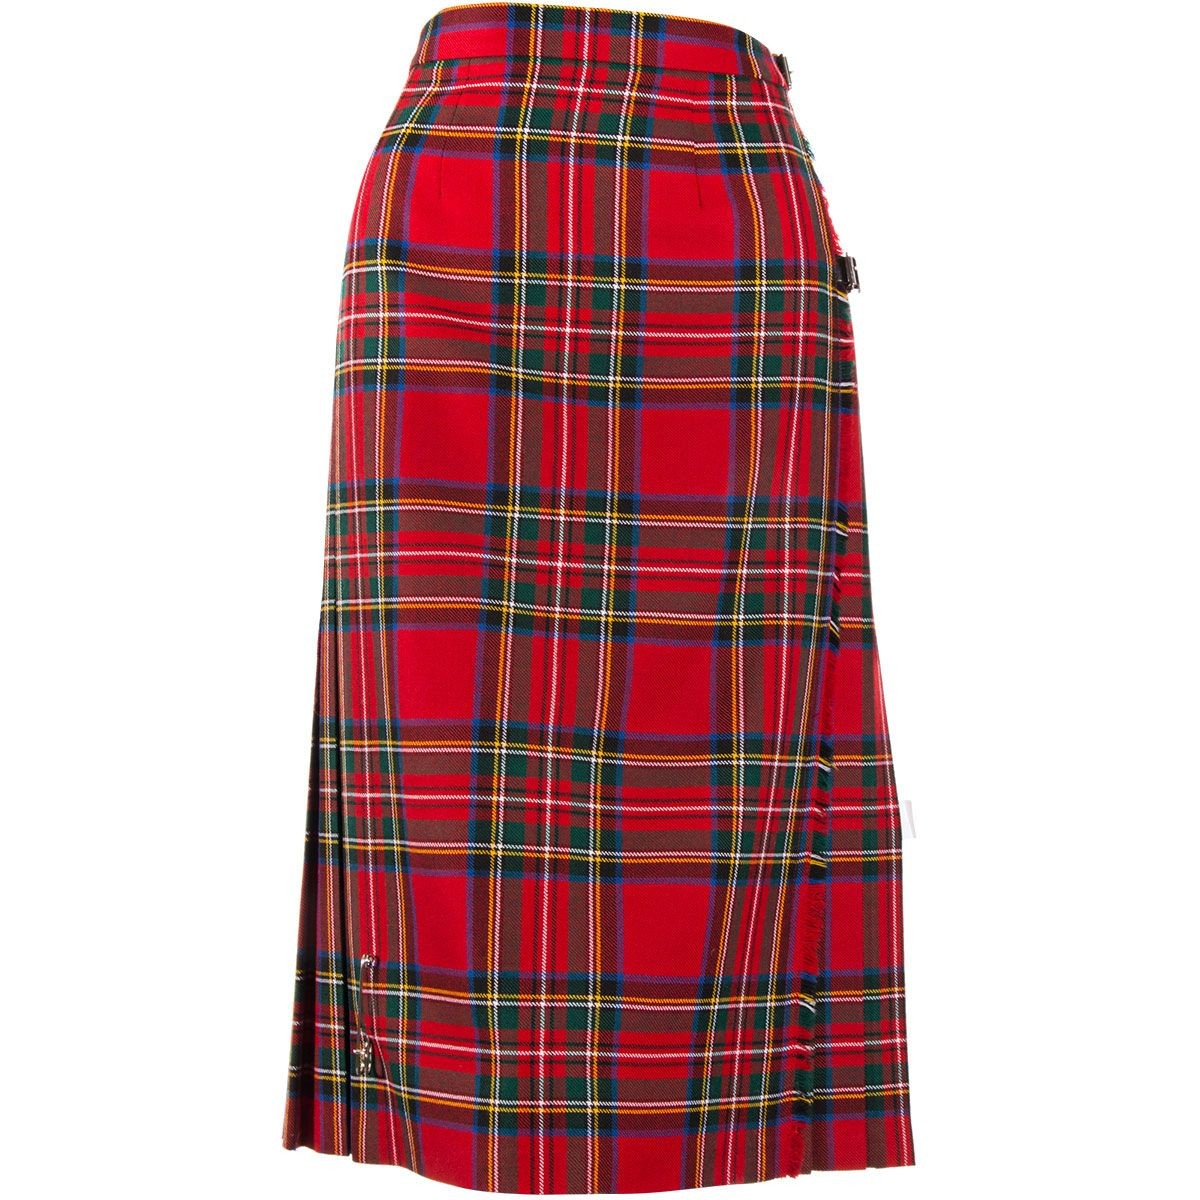 Ladies Tartan Semi Skirt - Front